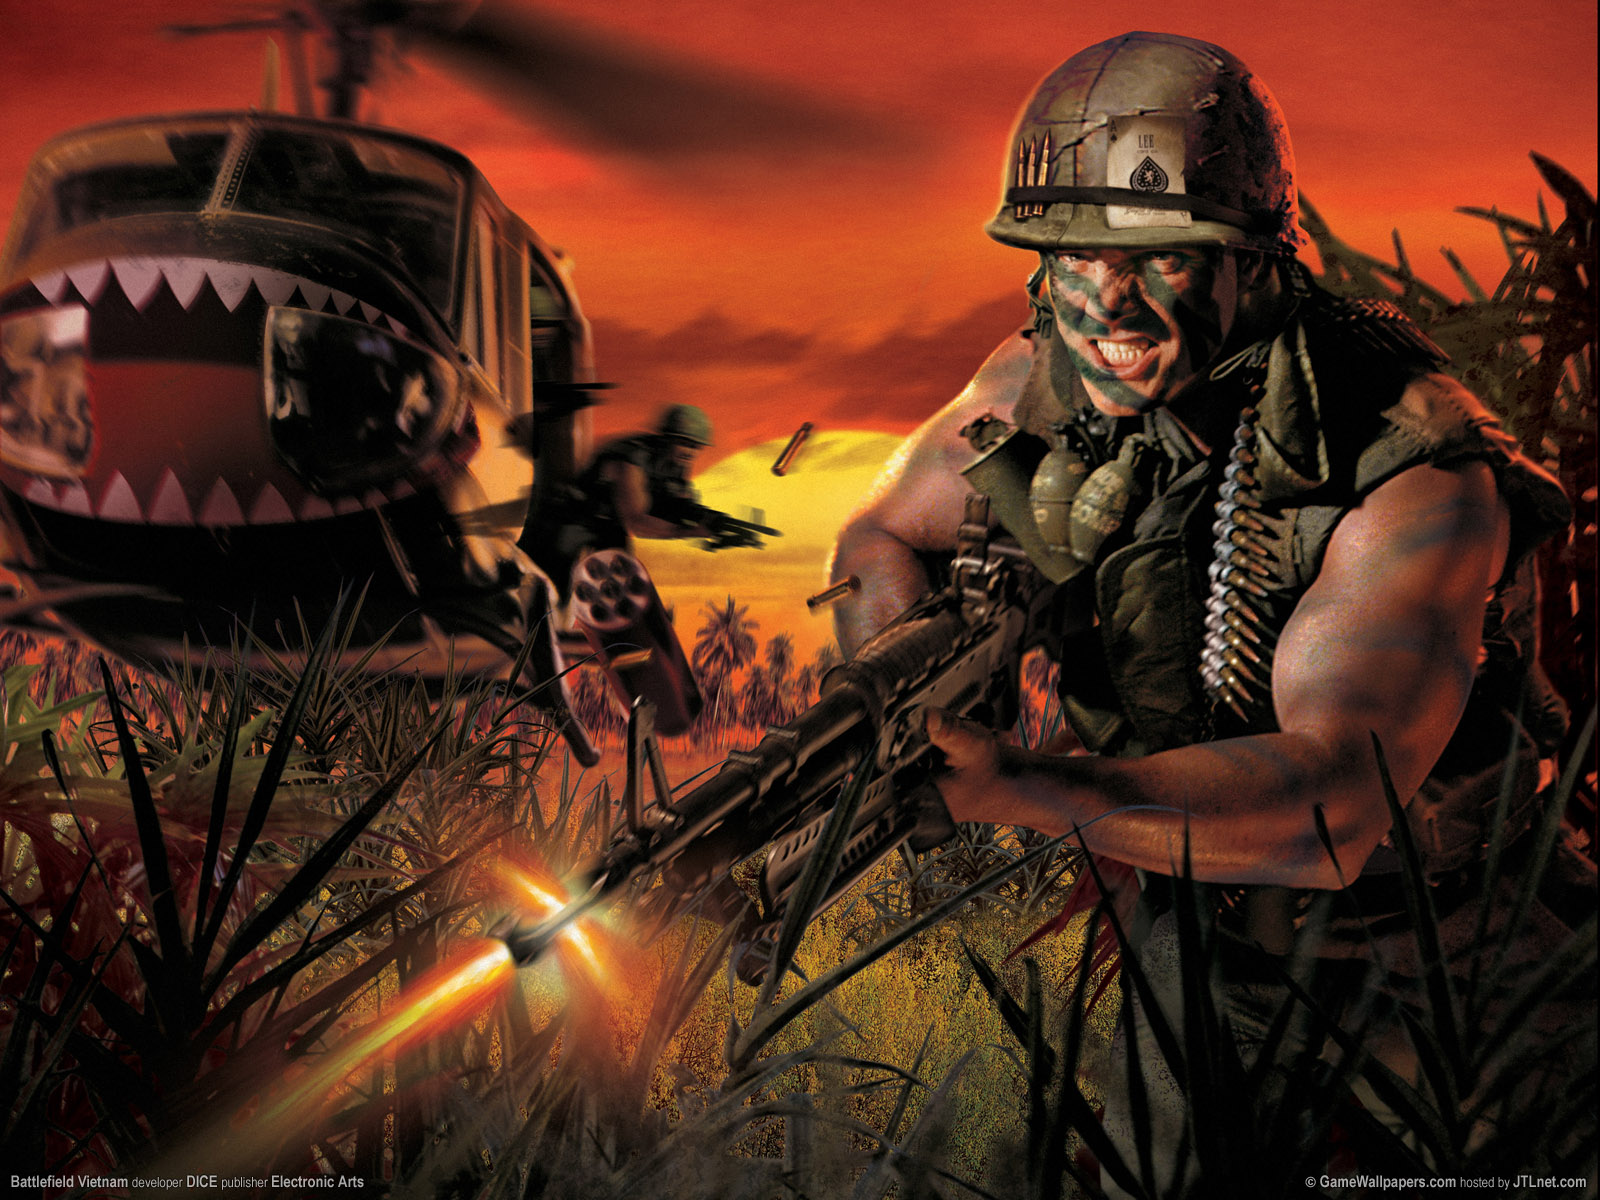 In The Vietnam War Wallpaper PicsWallpapercom 1600x1200